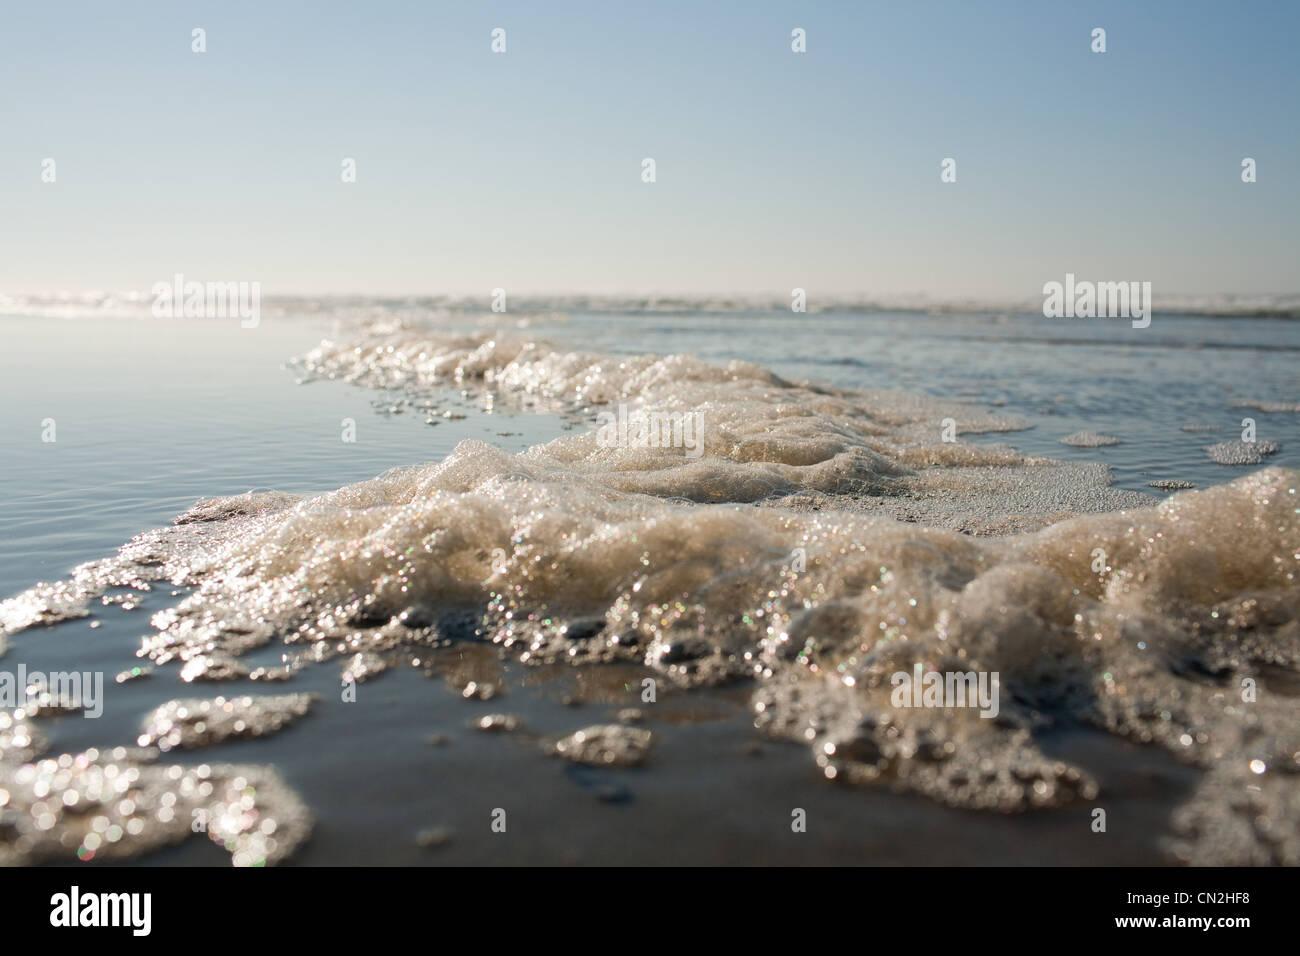 Meer Surfen am Rand des Wassers Stockbild